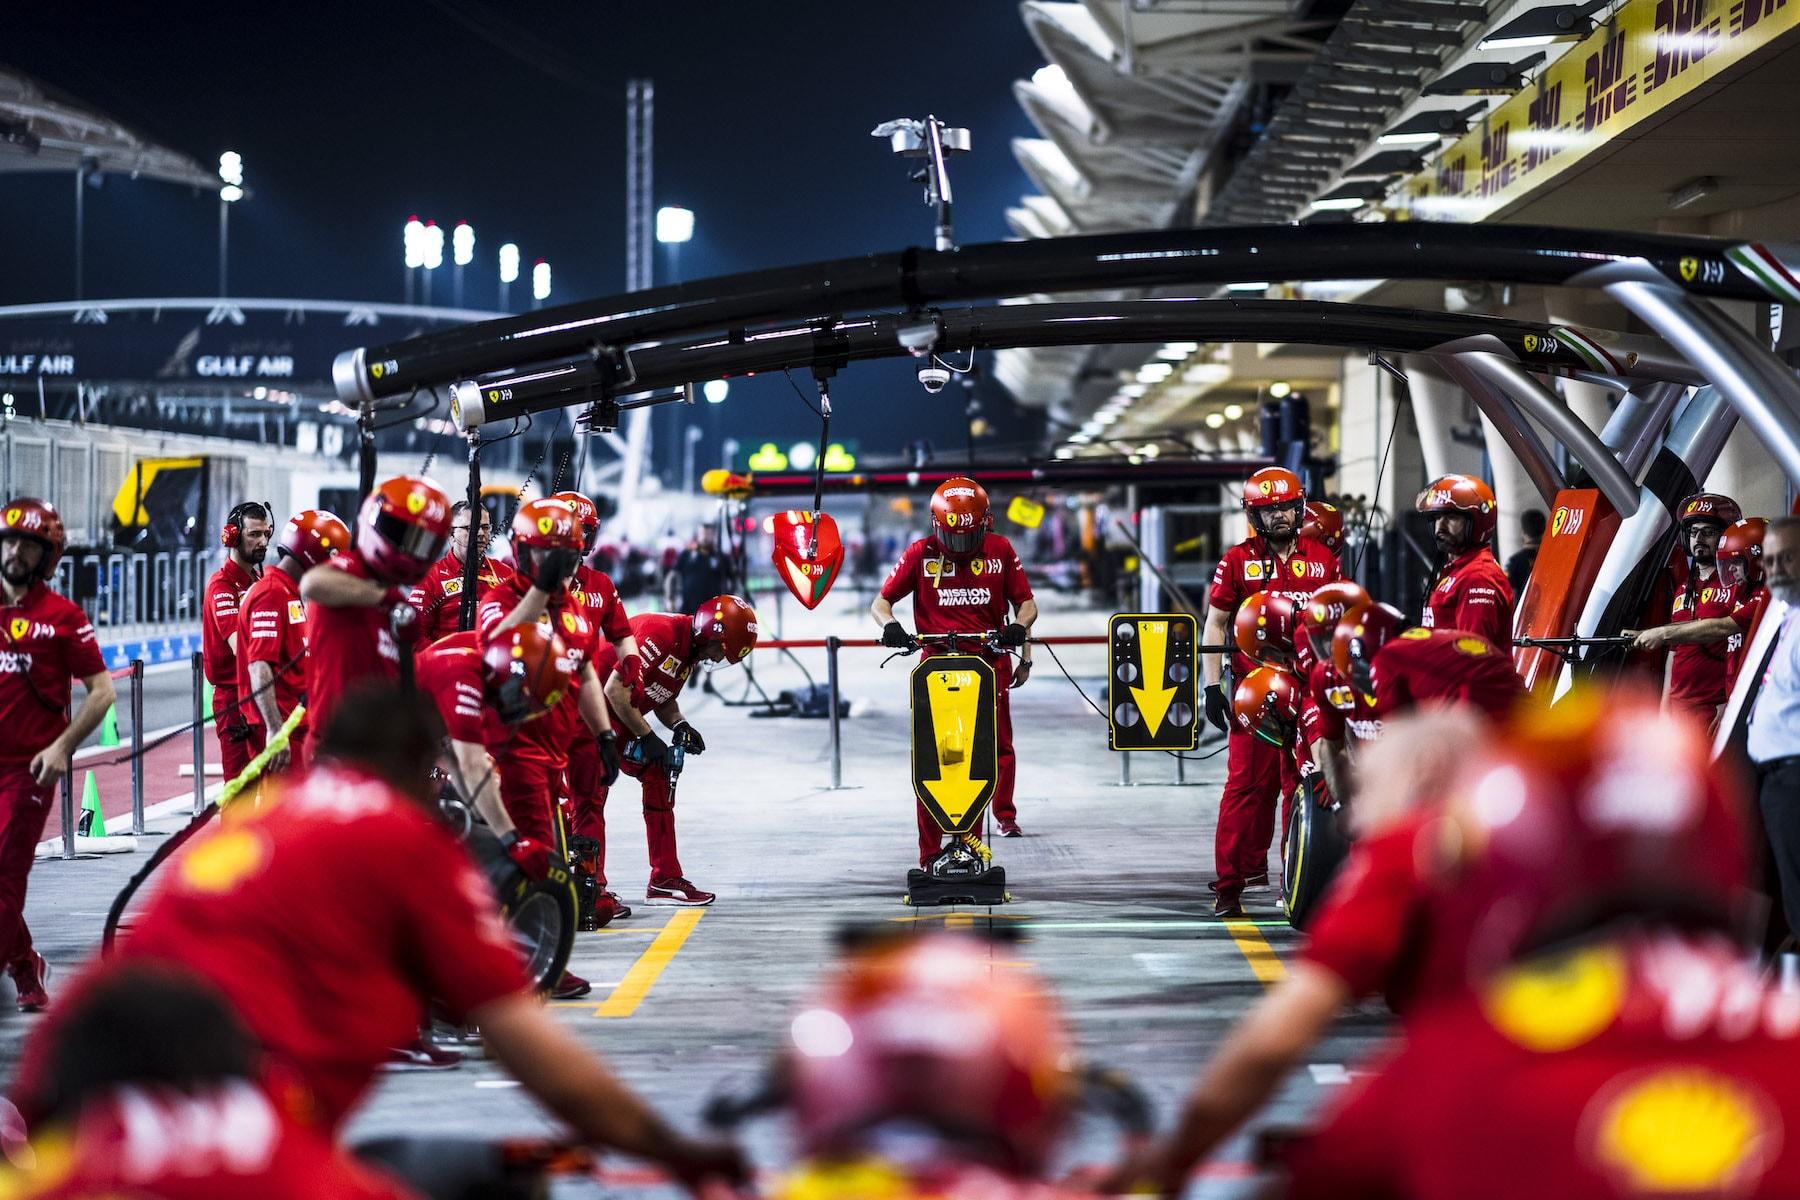 1 2019 Ferrari pitstop practice | 2019 Bahrain GP copy.jpg